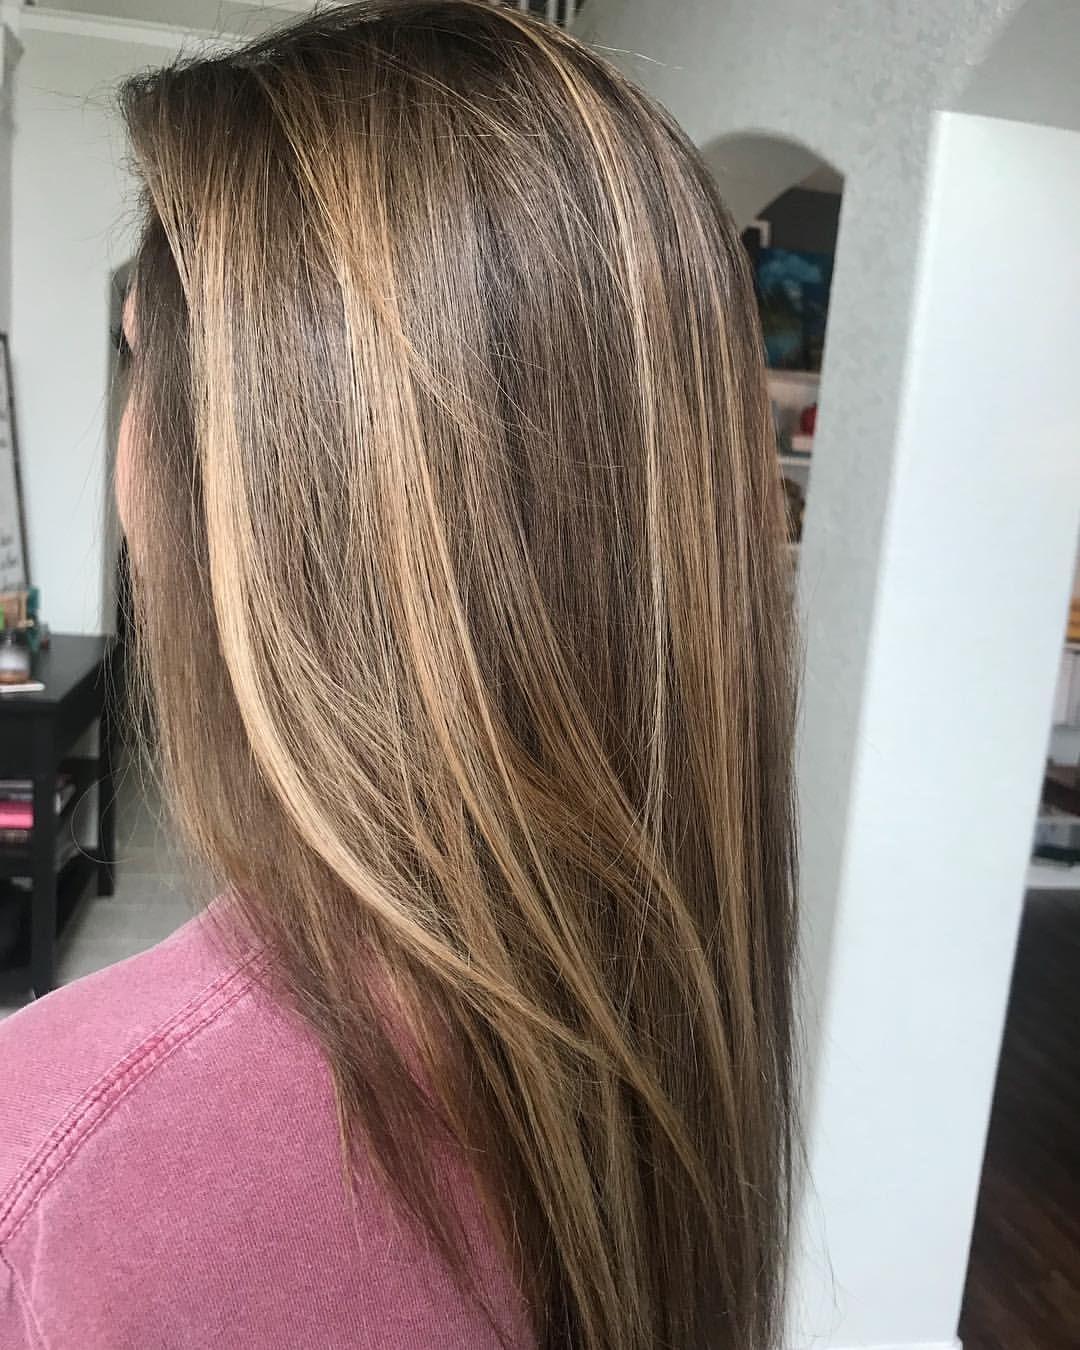 "Christine Davis on Instagram: ""Snickers! . . . . #balayage #brunette #brunettebalayage #phbonder #redken #shadeseq #redkenshadeseq #hair #hairstylist #ilovemyjob…"""